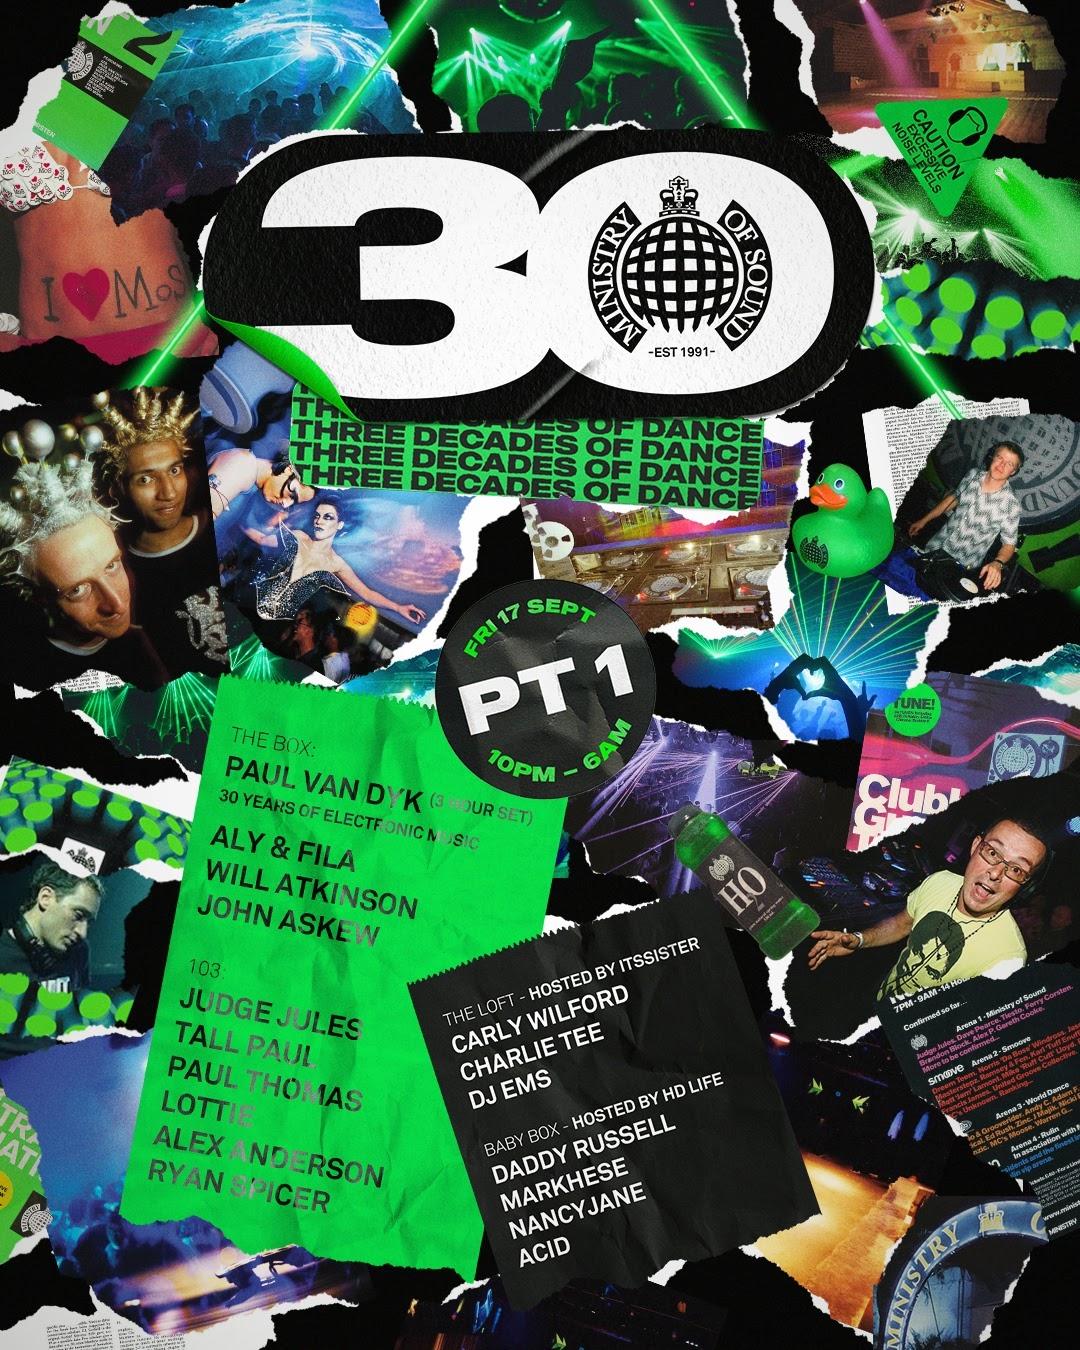 Ministry of Sound fête ses 30 ans